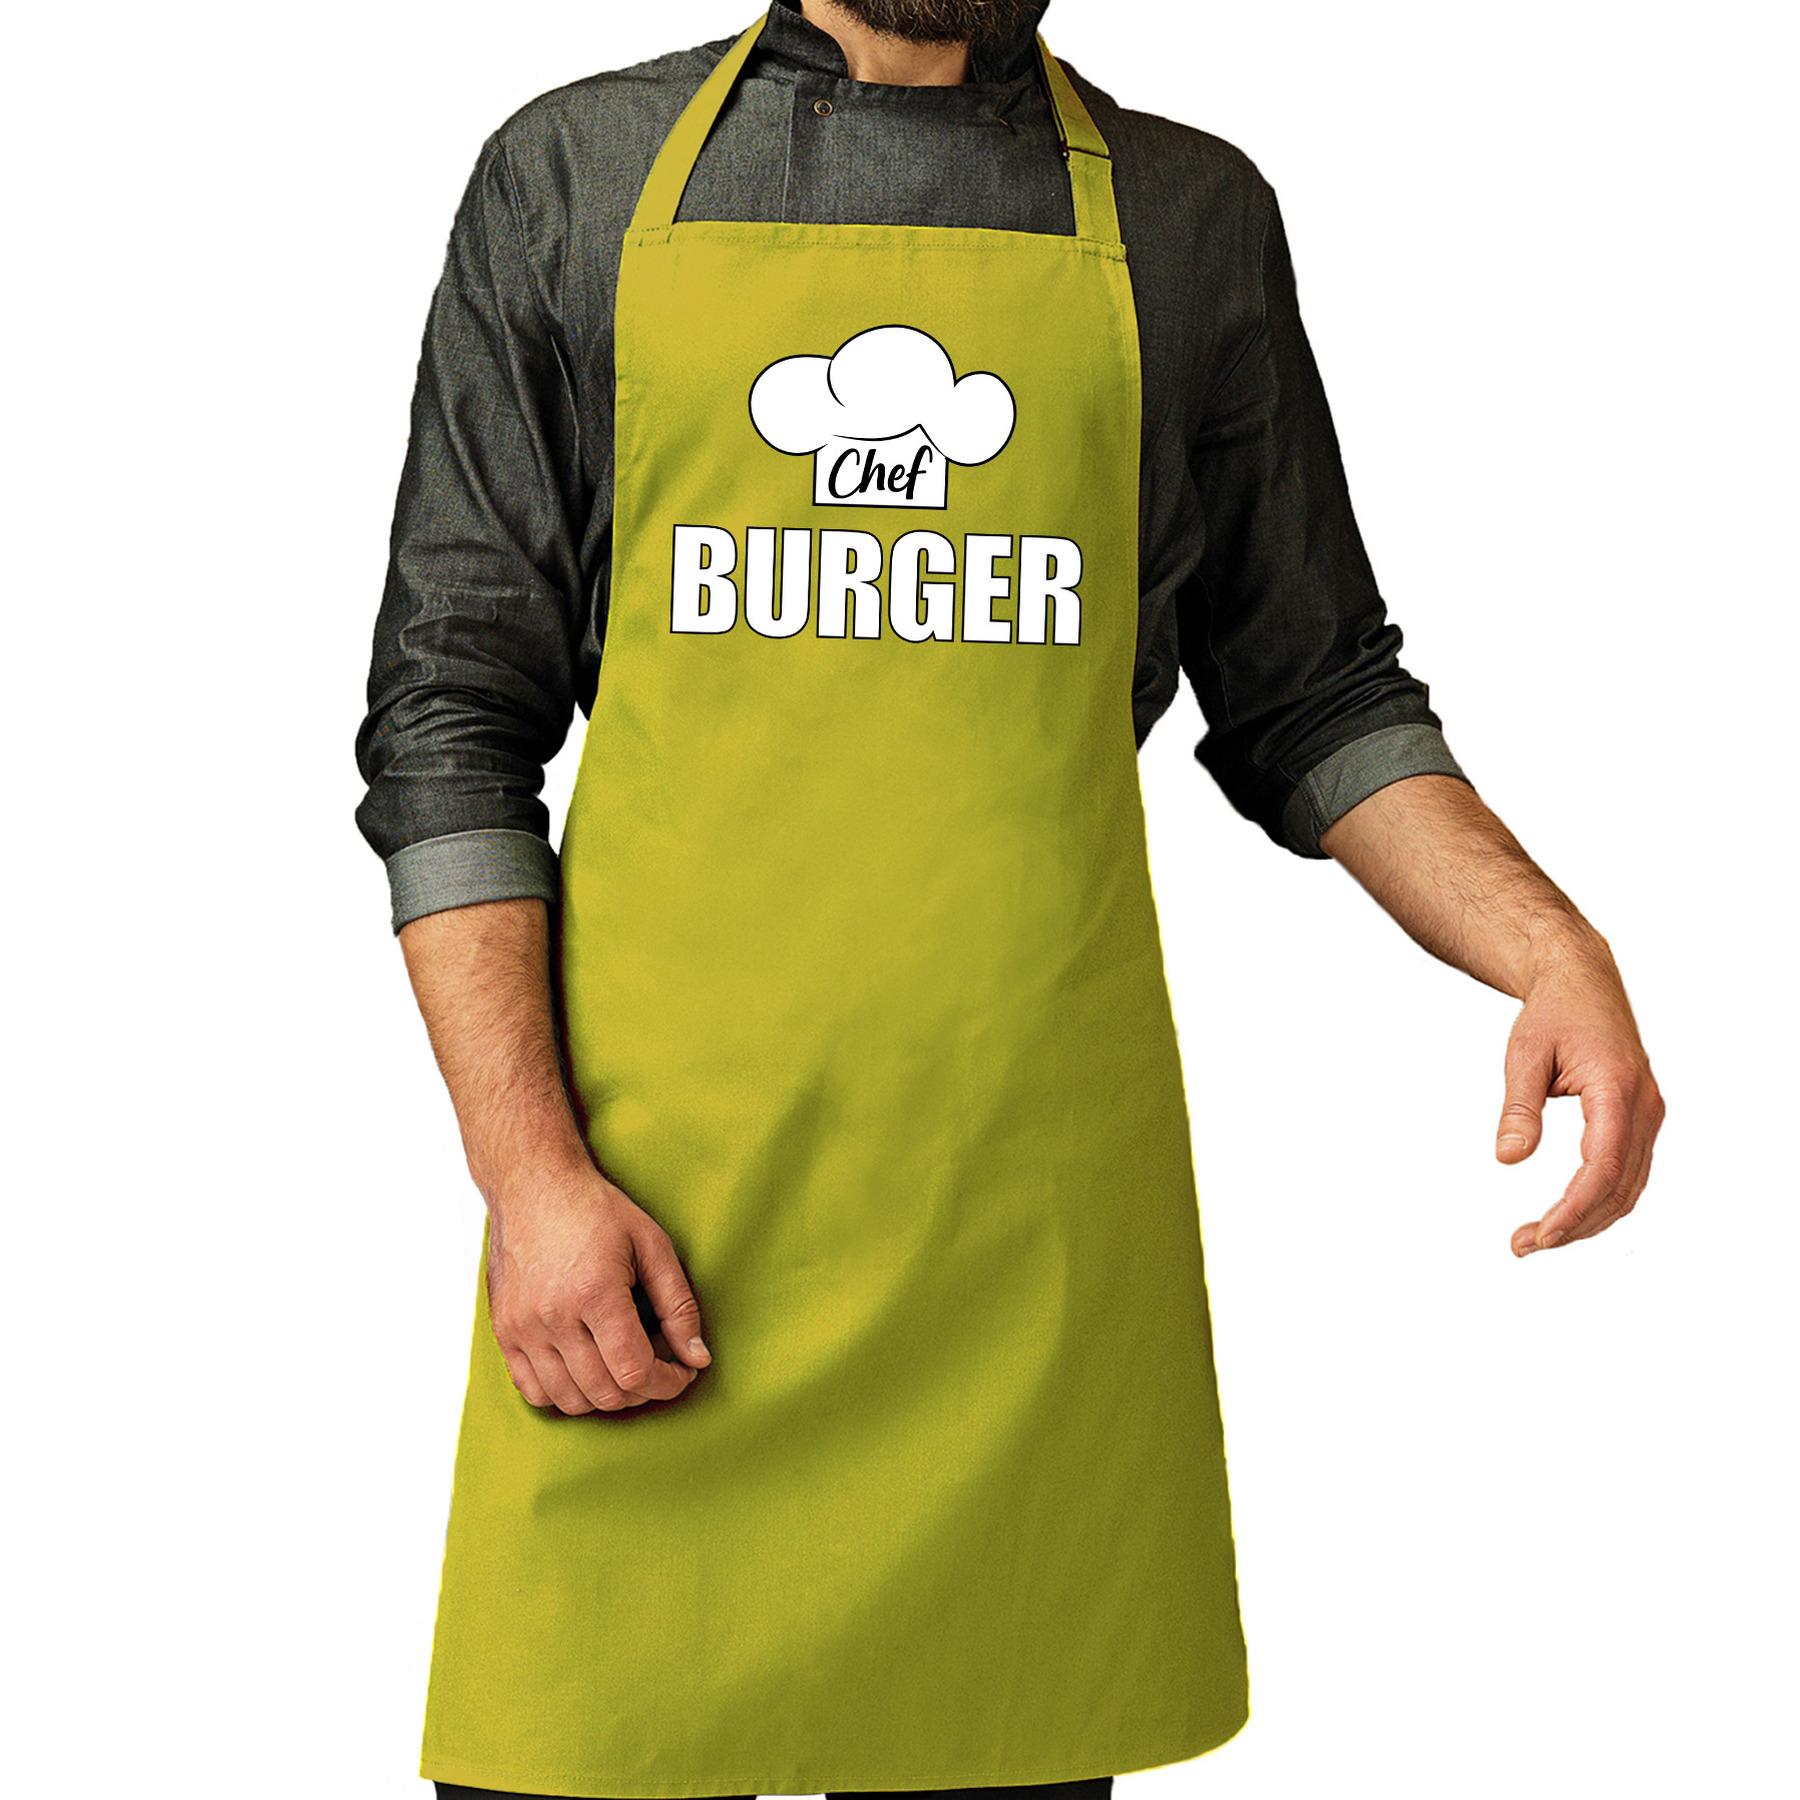 Chef burger schort - keukenschort lime groen heren